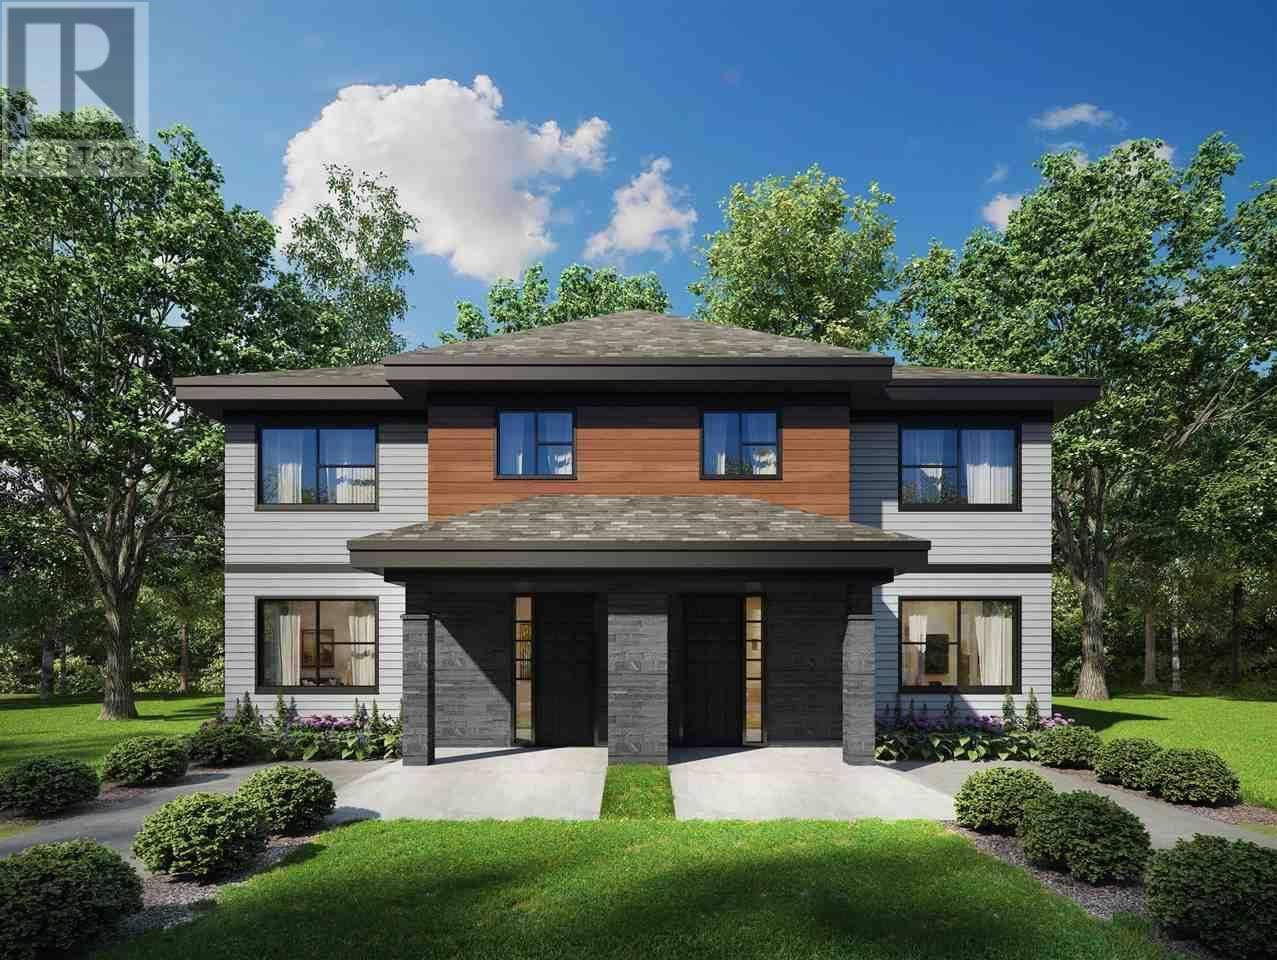 House for sale at 758 Herring Cove Rd Unit A Herring Cove Nova Scotia - MLS: 201919220